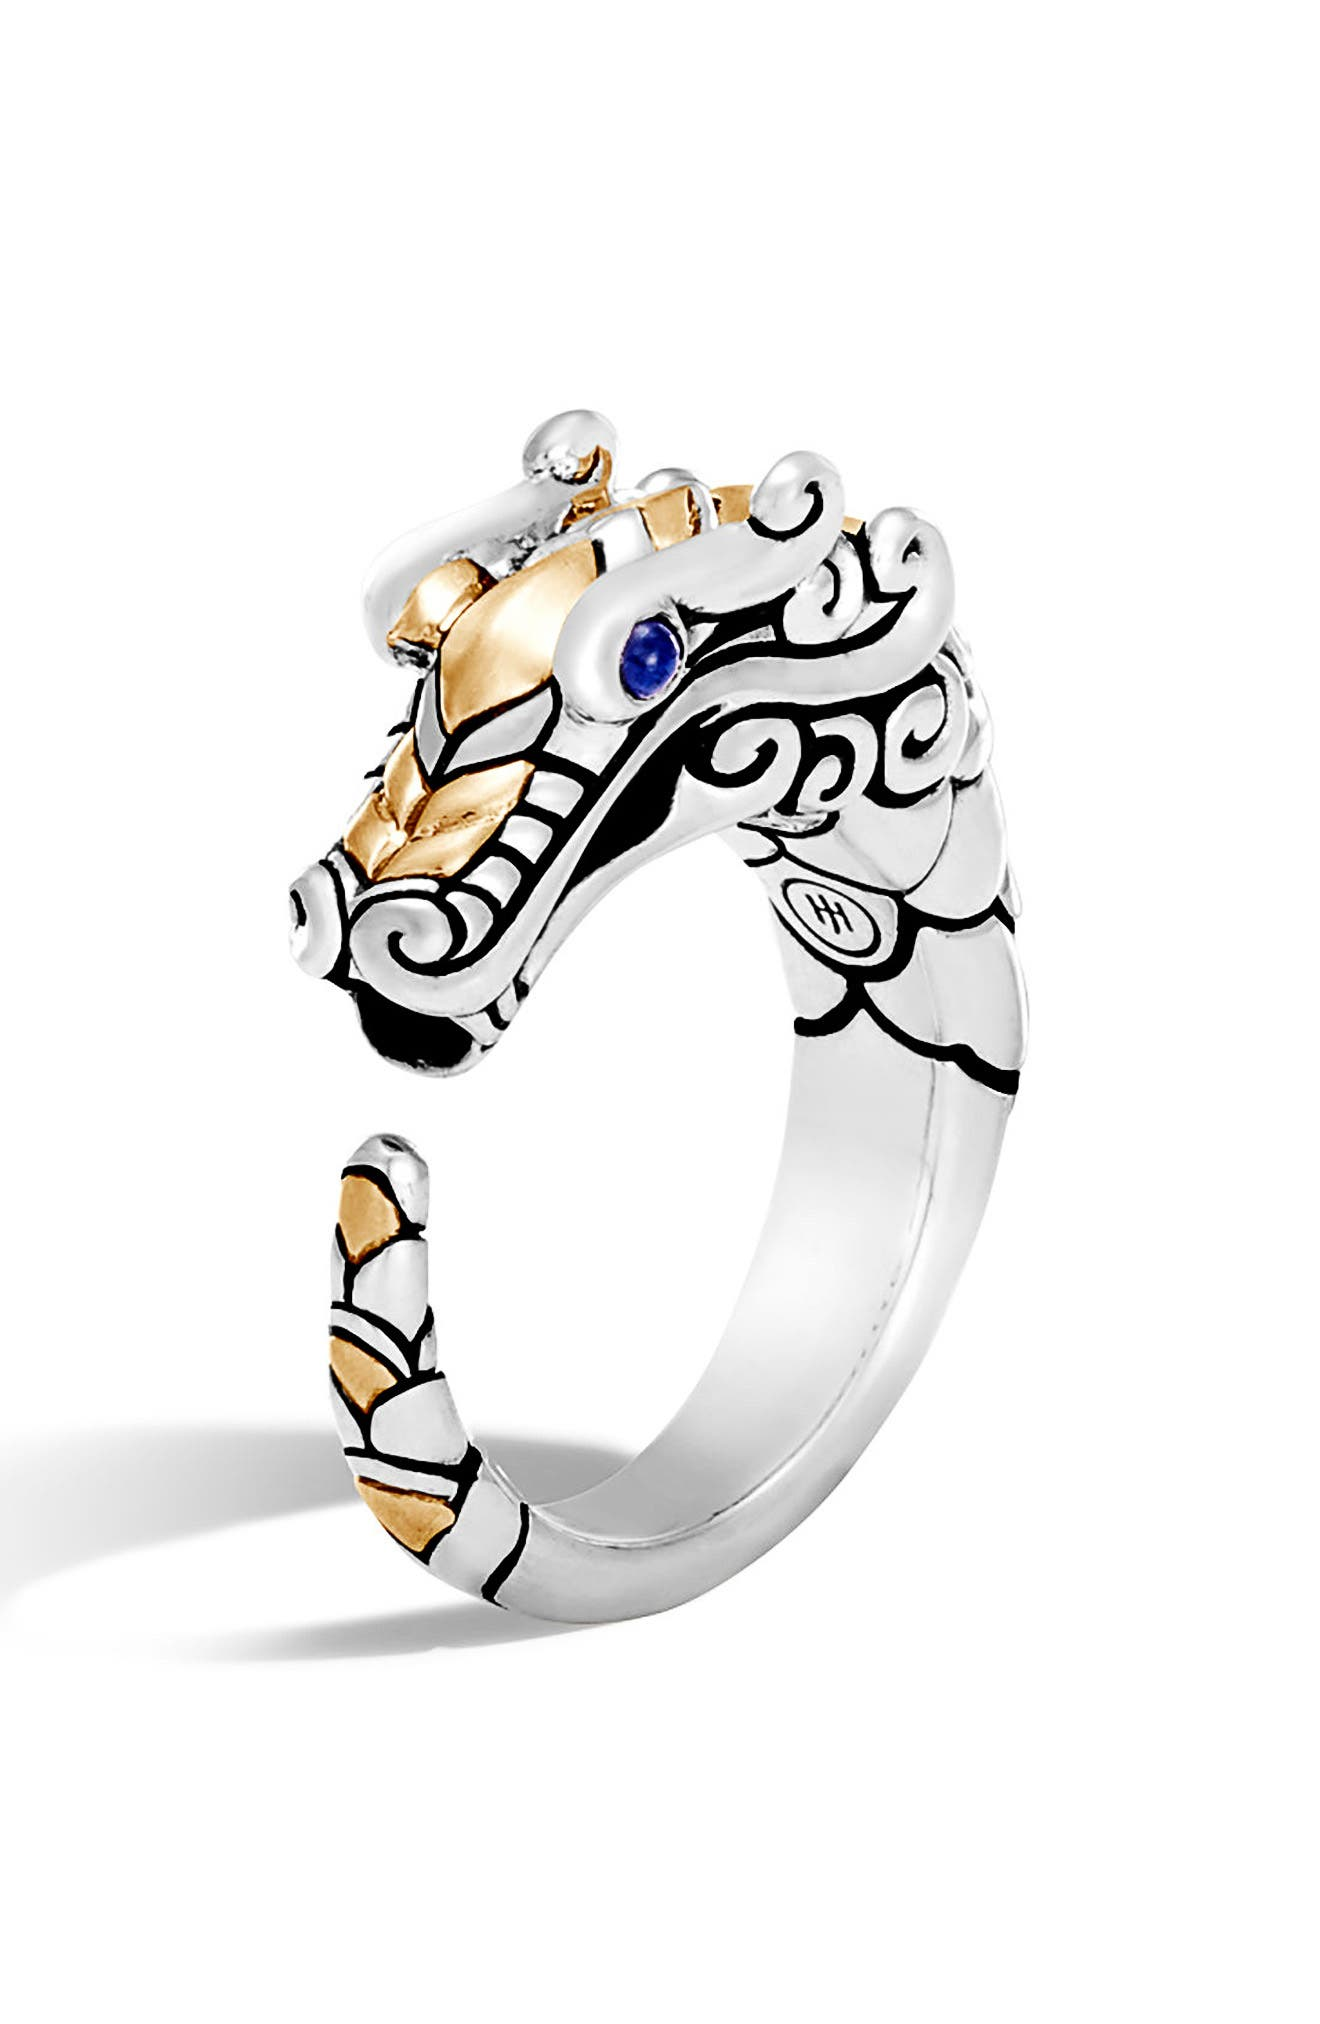 Legends Naga Ring,                             Main thumbnail 1, color,                             Silver/ Black/ Blue Sapphire